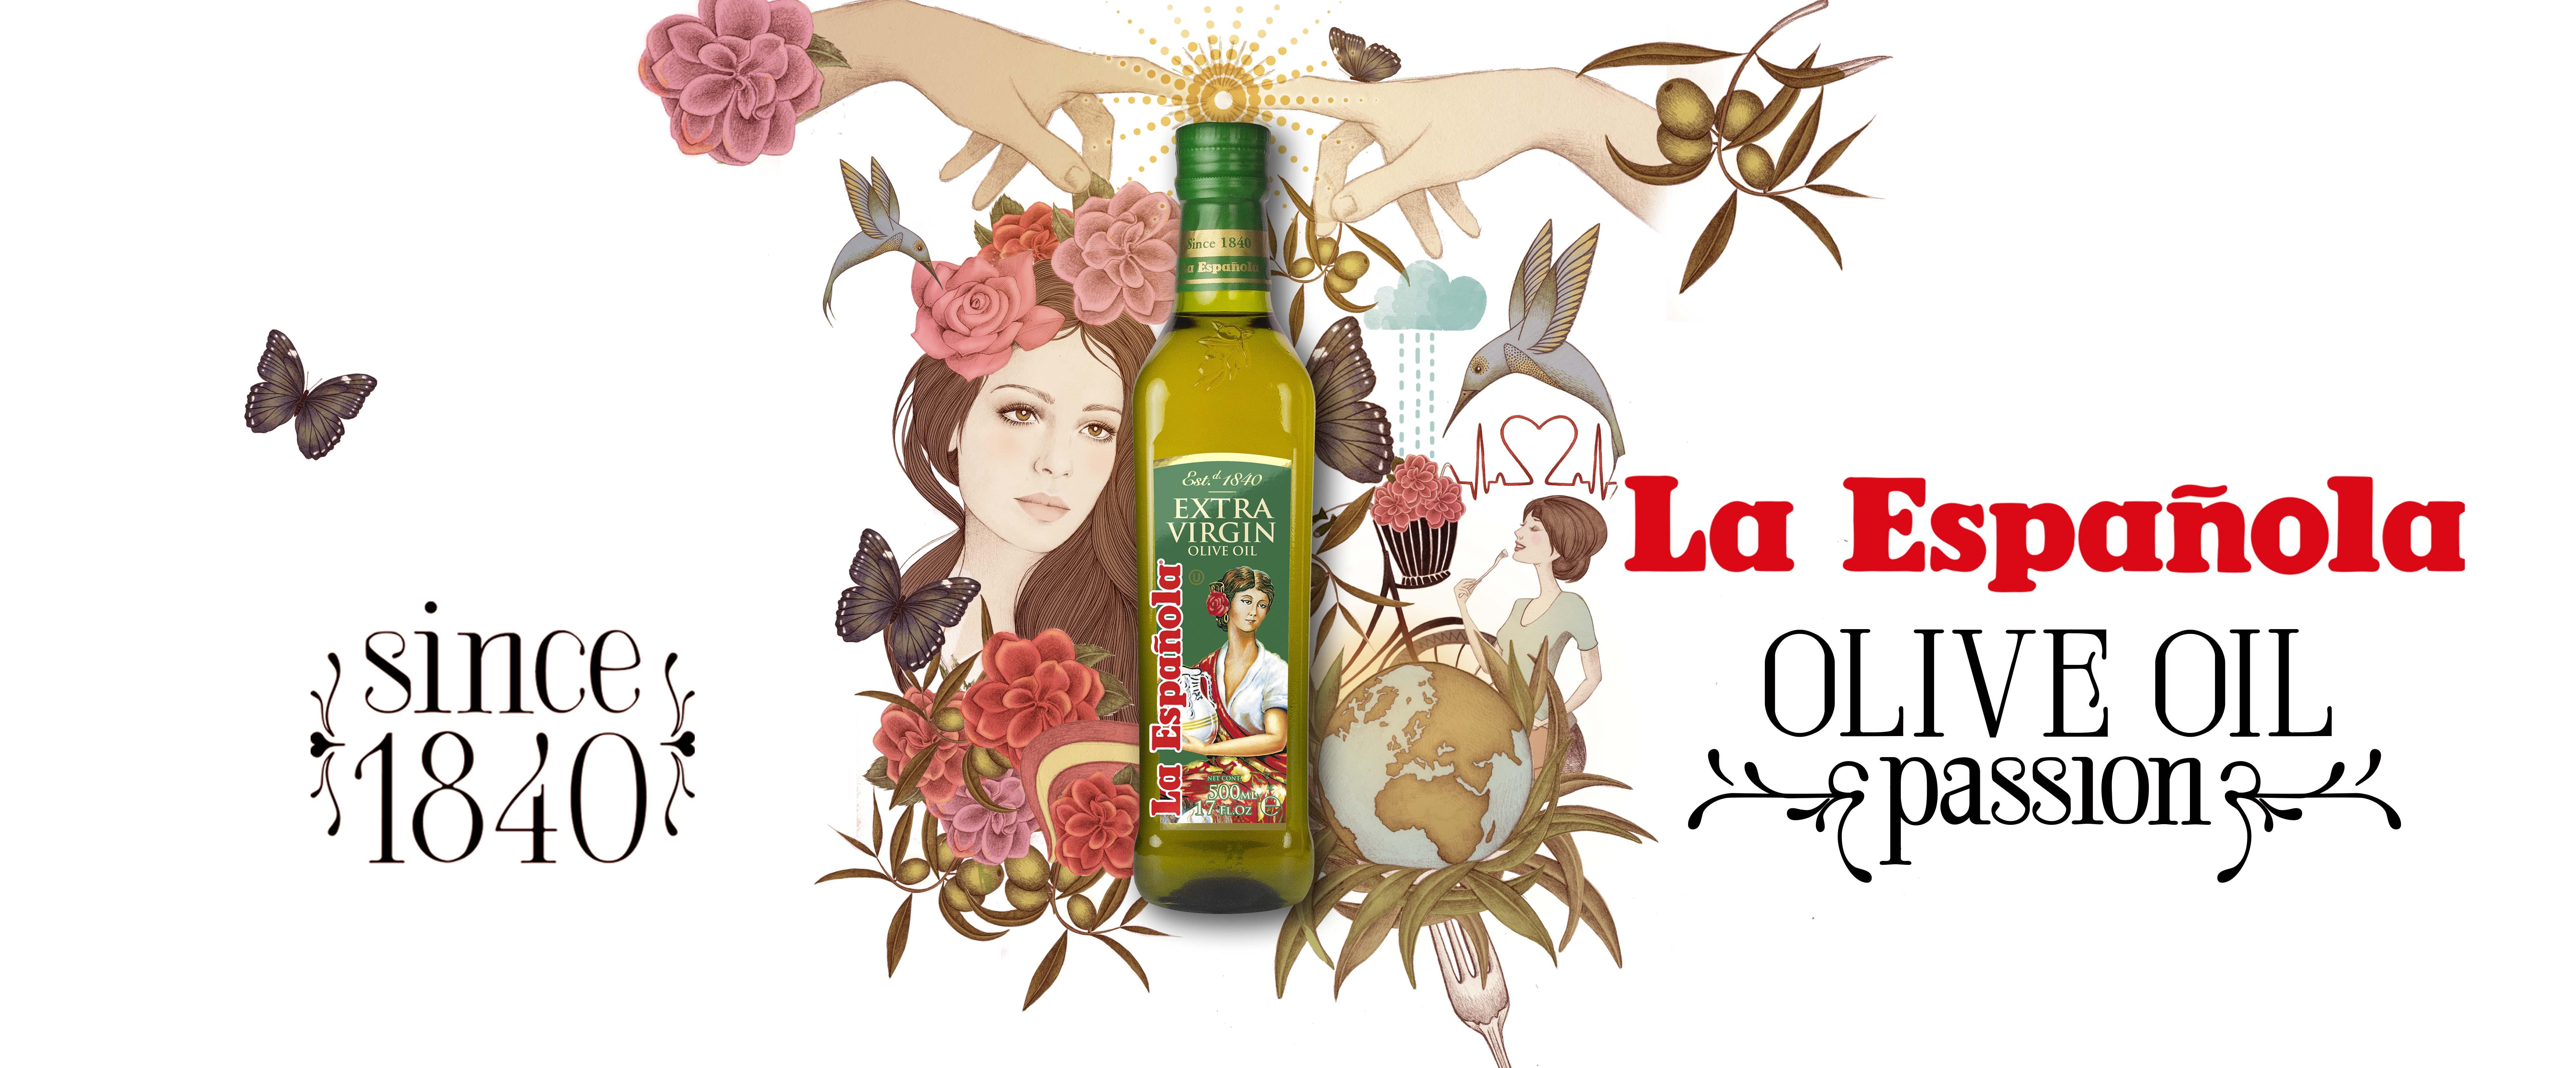 http://www.marcasrenombradas.com/wp-content/uploads/2014/07/laespanola-4.jpg